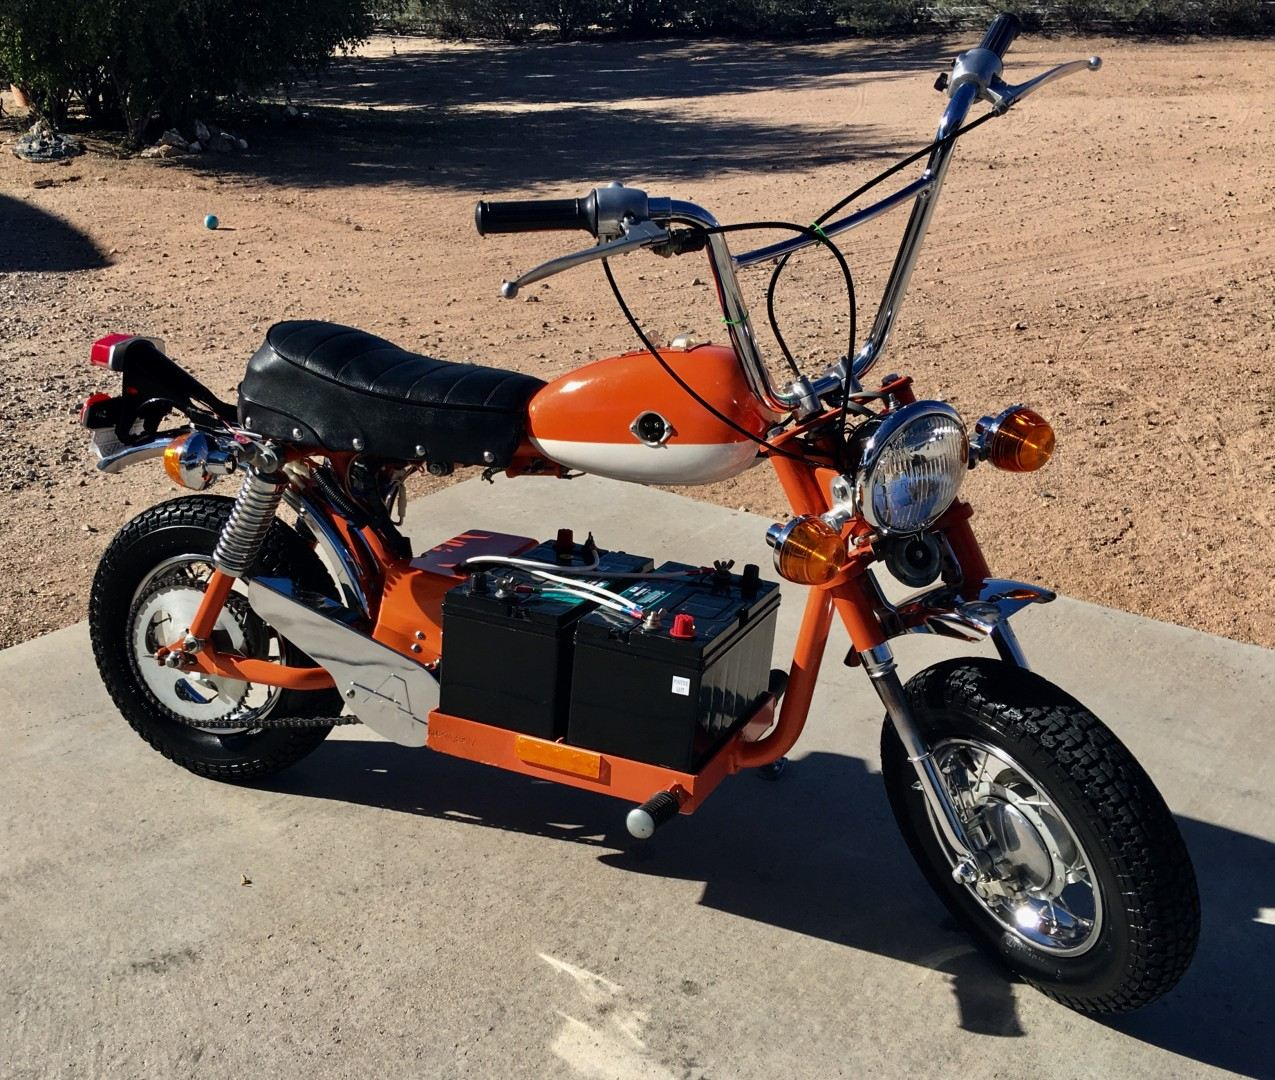 Moto del día: Honda VF 1000 F | espíritu RACER moto